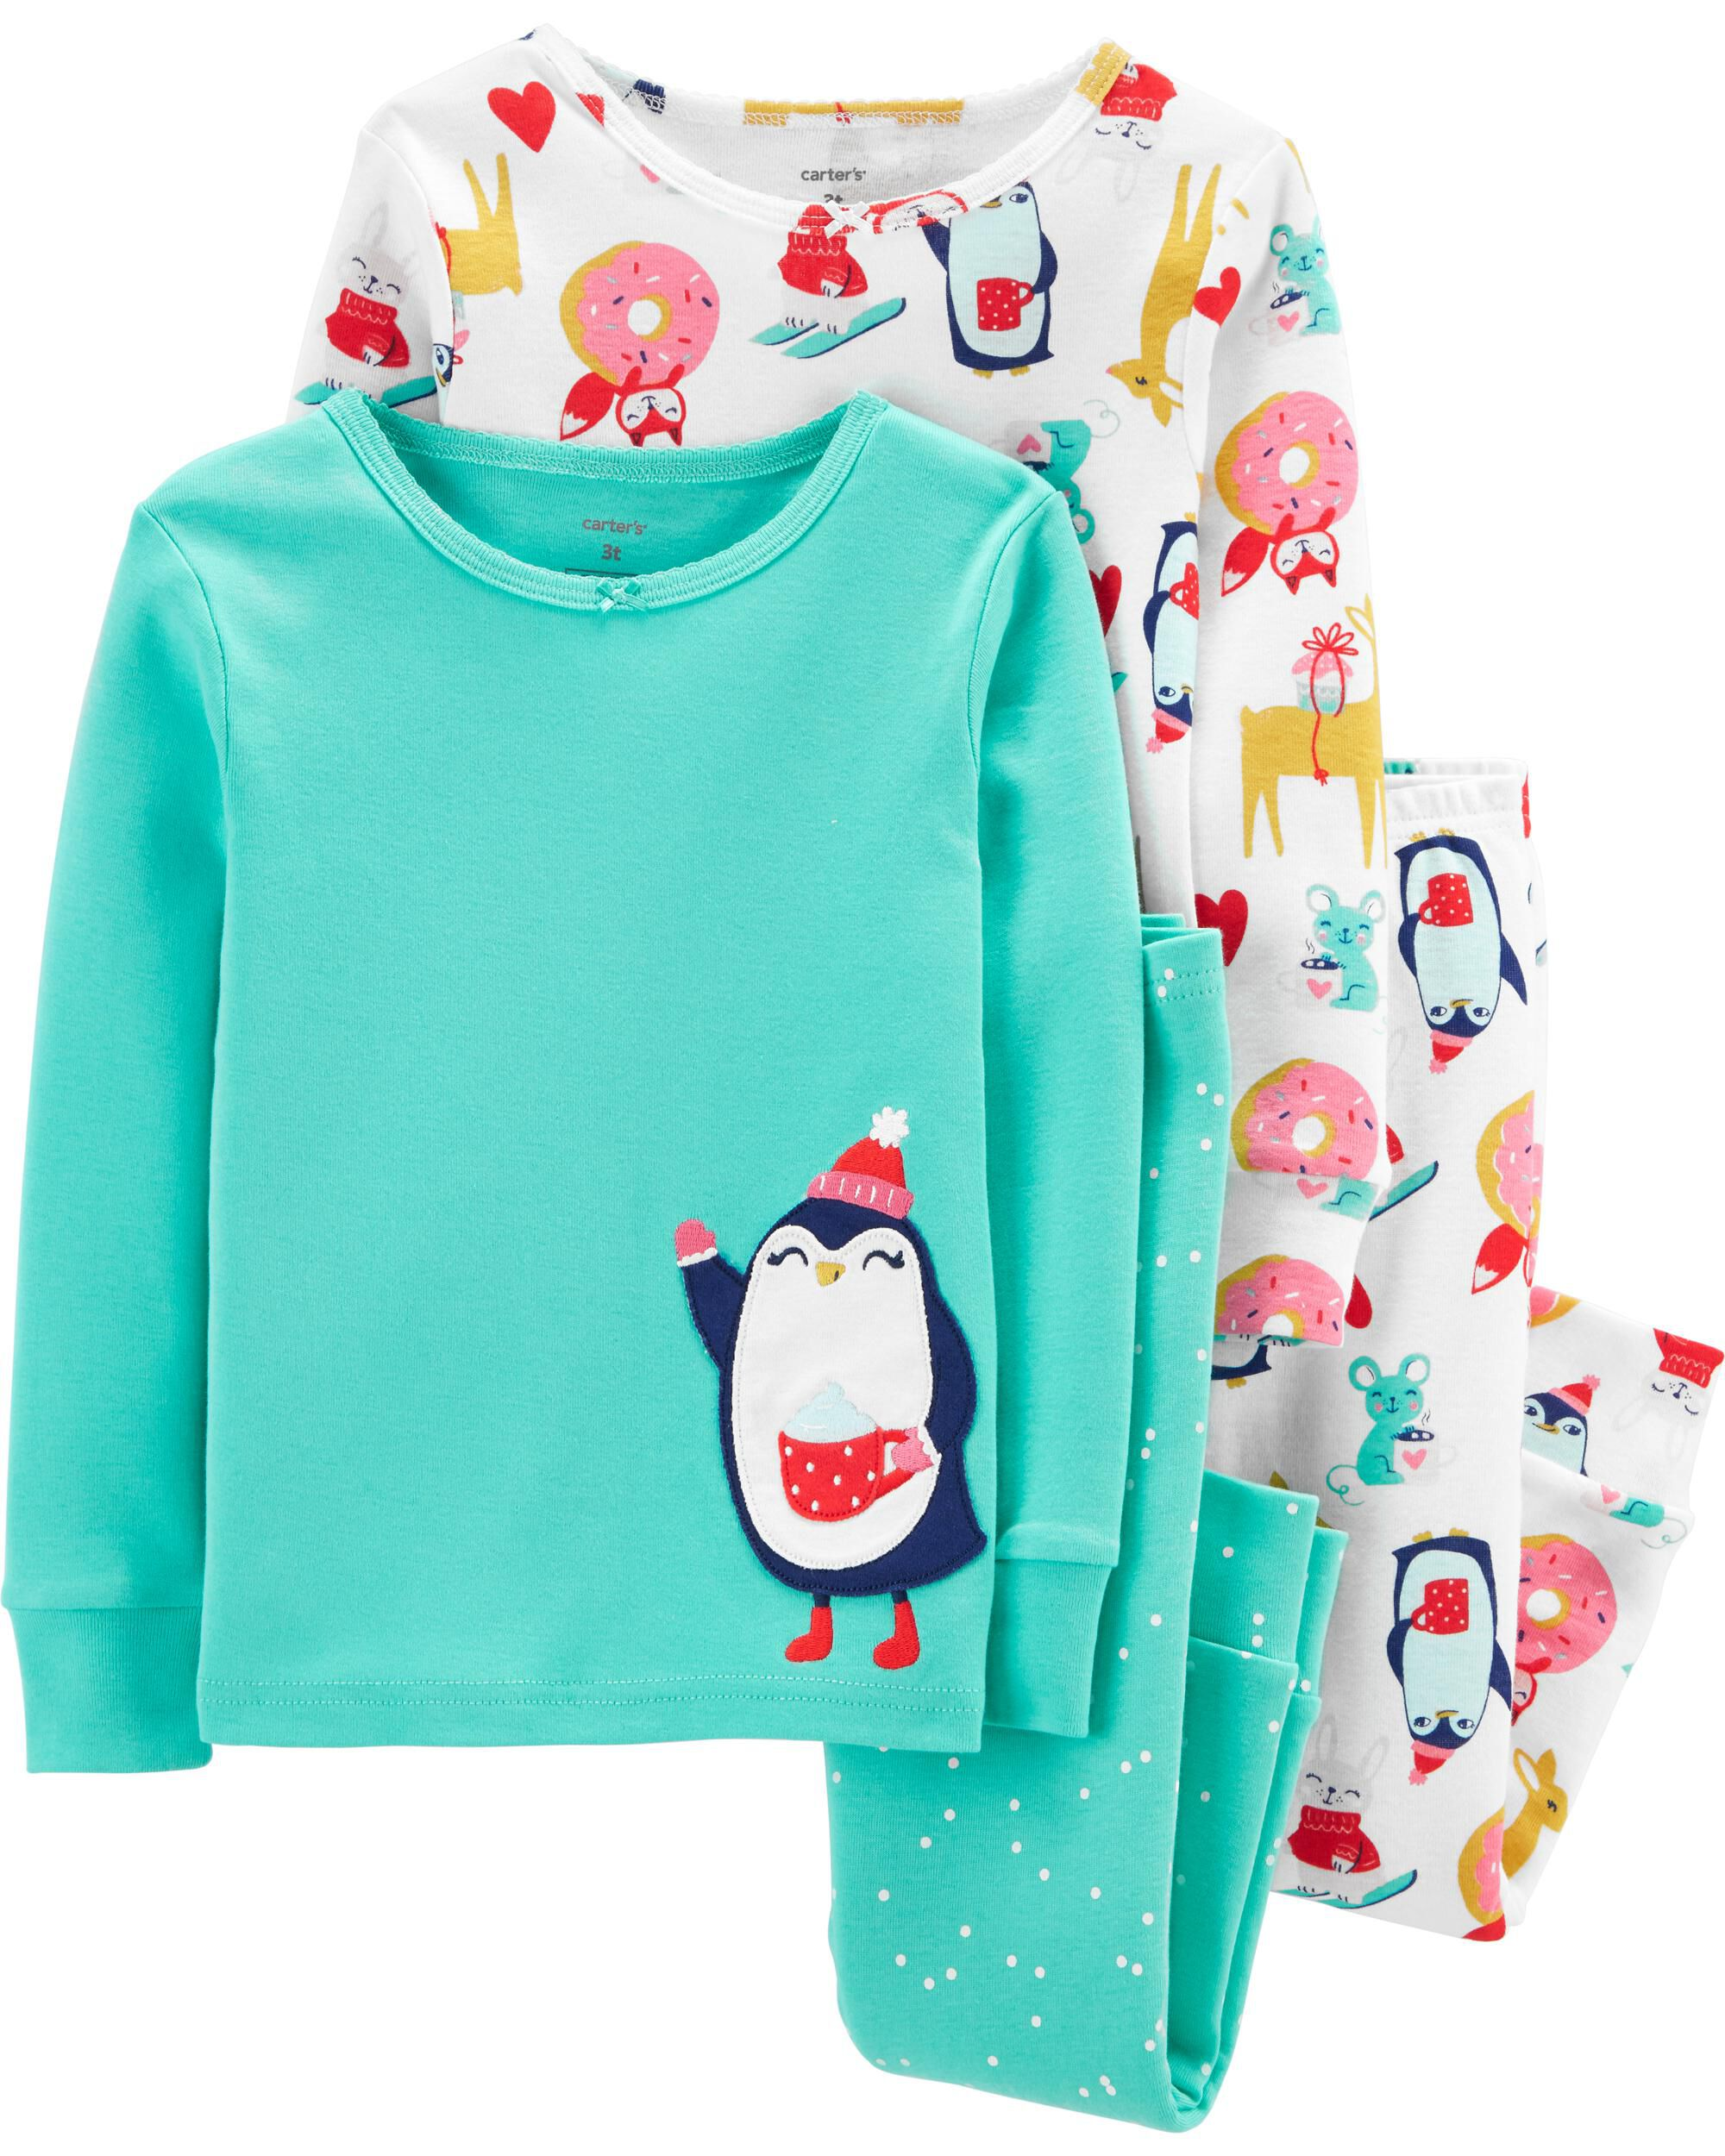 *CLEARANCE* 4-Piece Penguin Snug Fit Cotton PJs